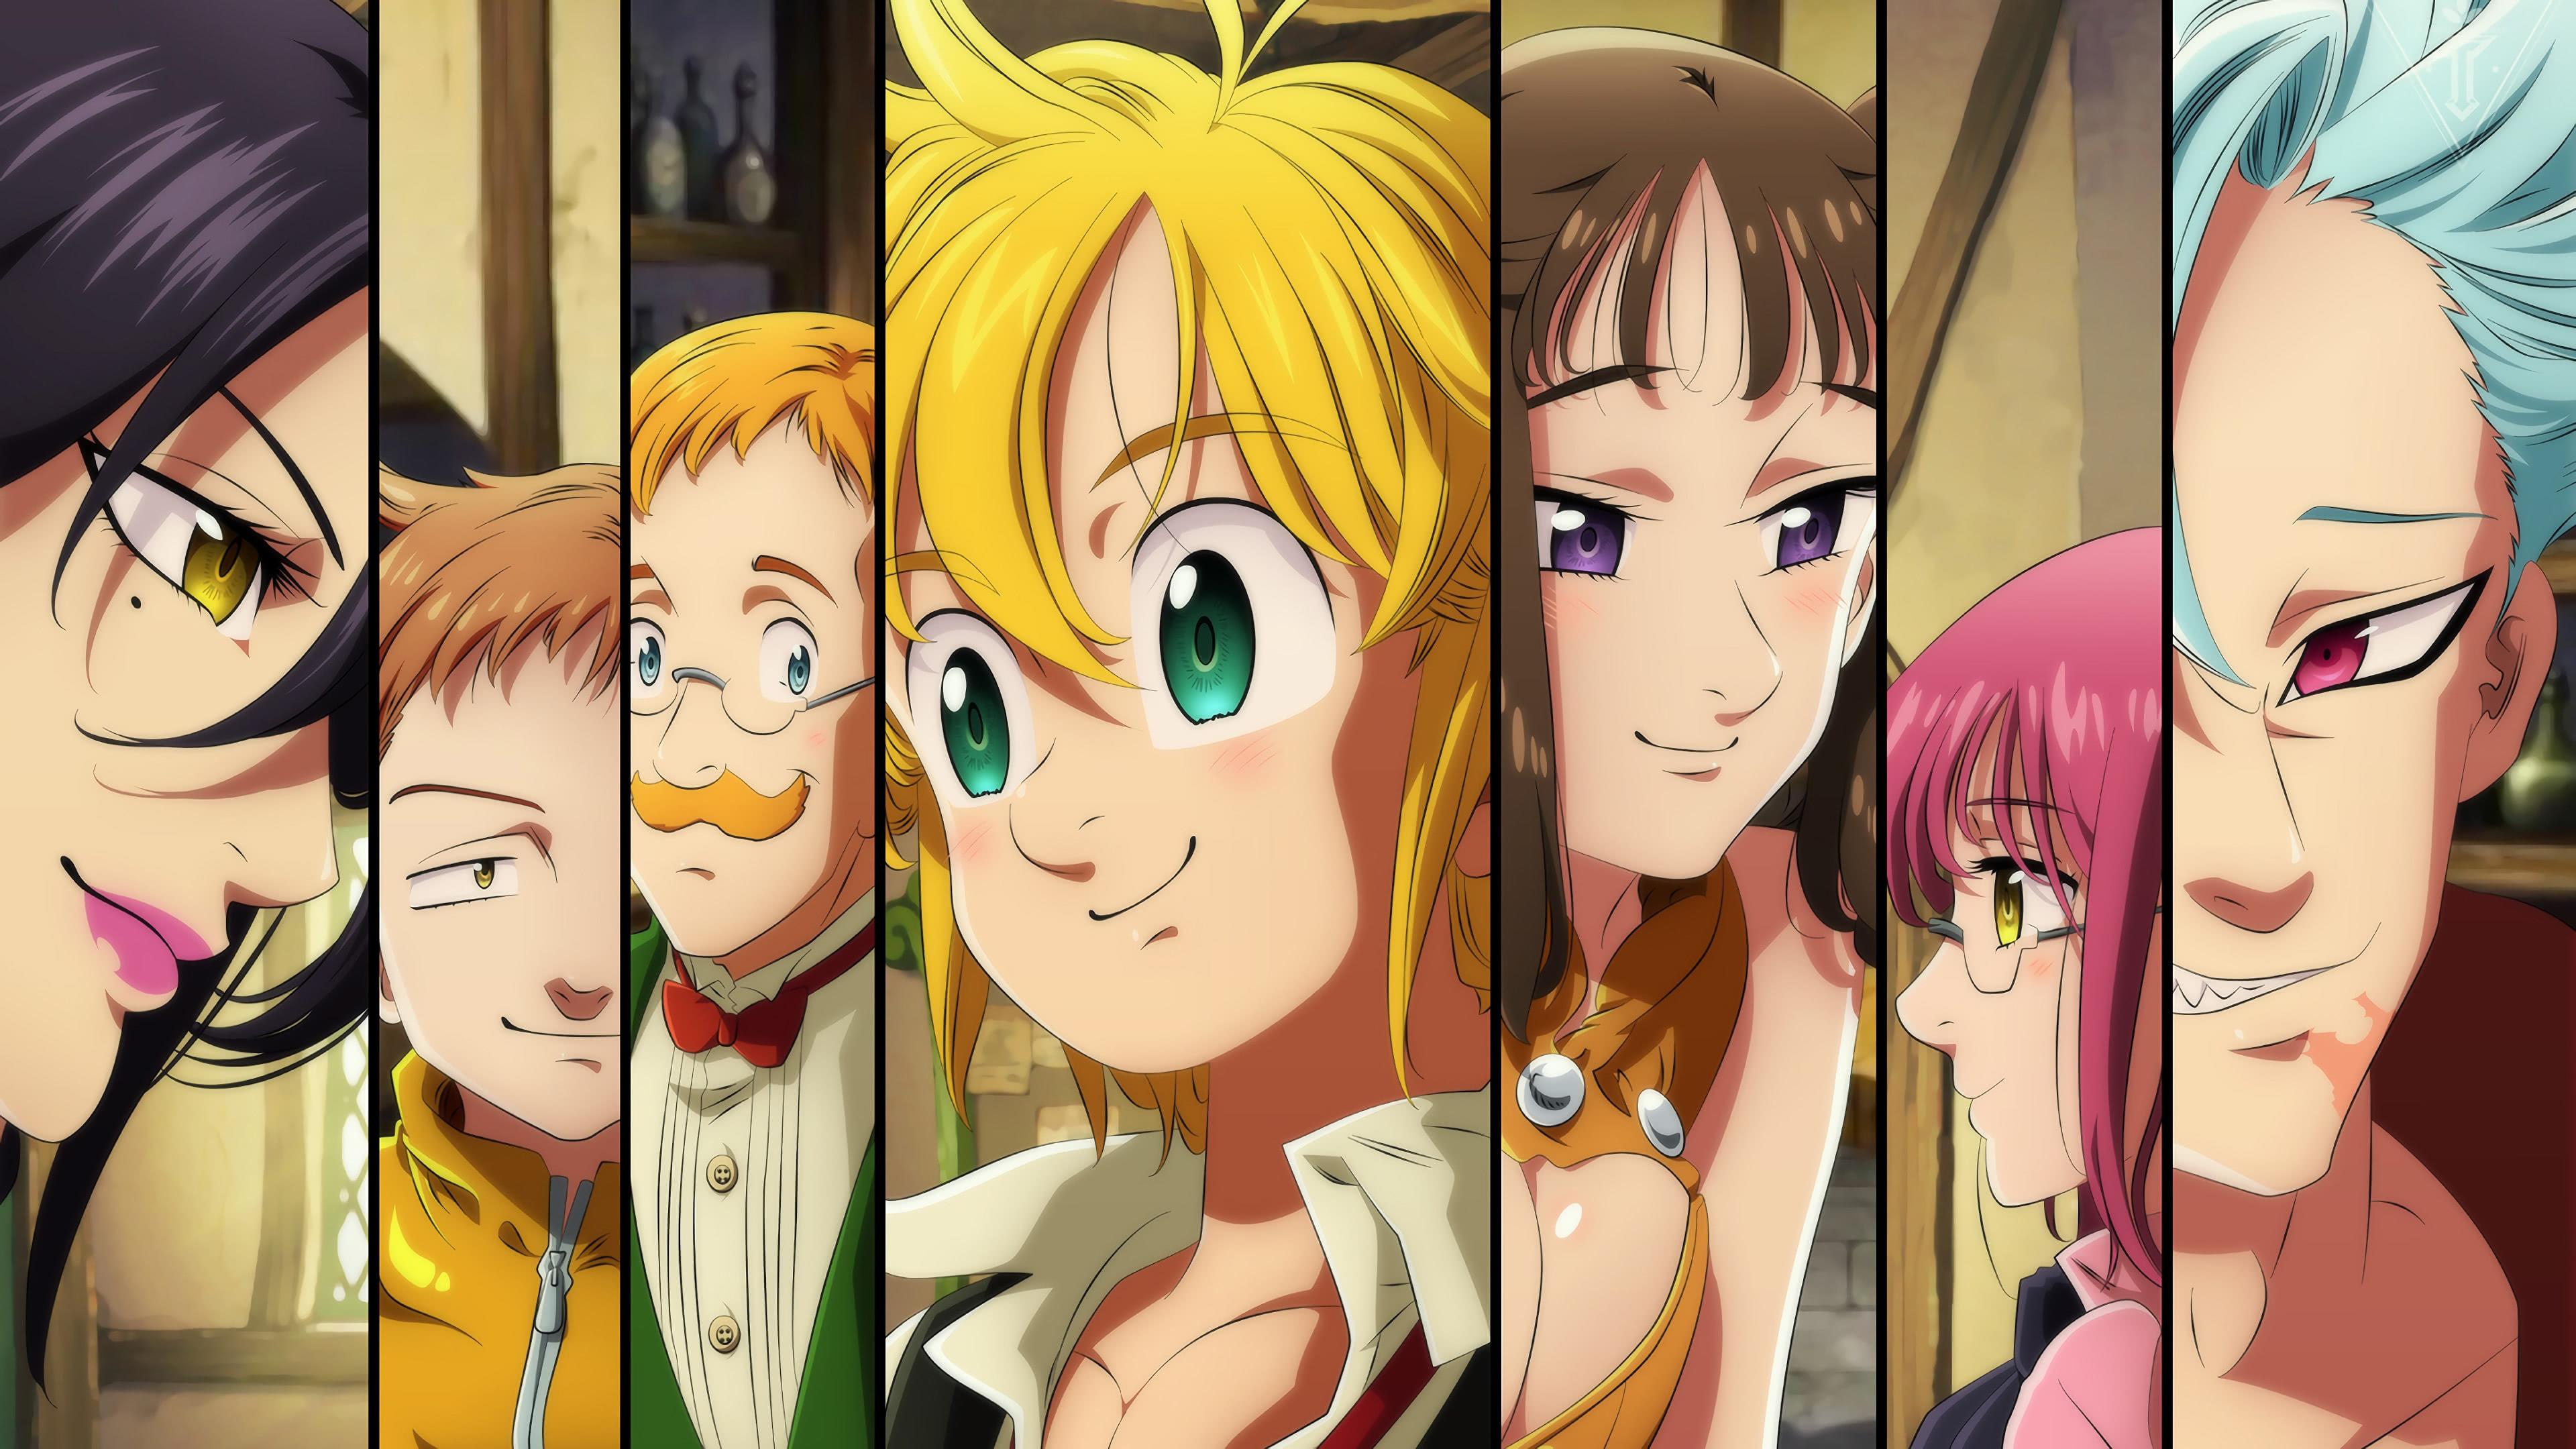 Nanatsu No Taizai Seven Deadly Sins Characters Uhd 4k Wallpaper